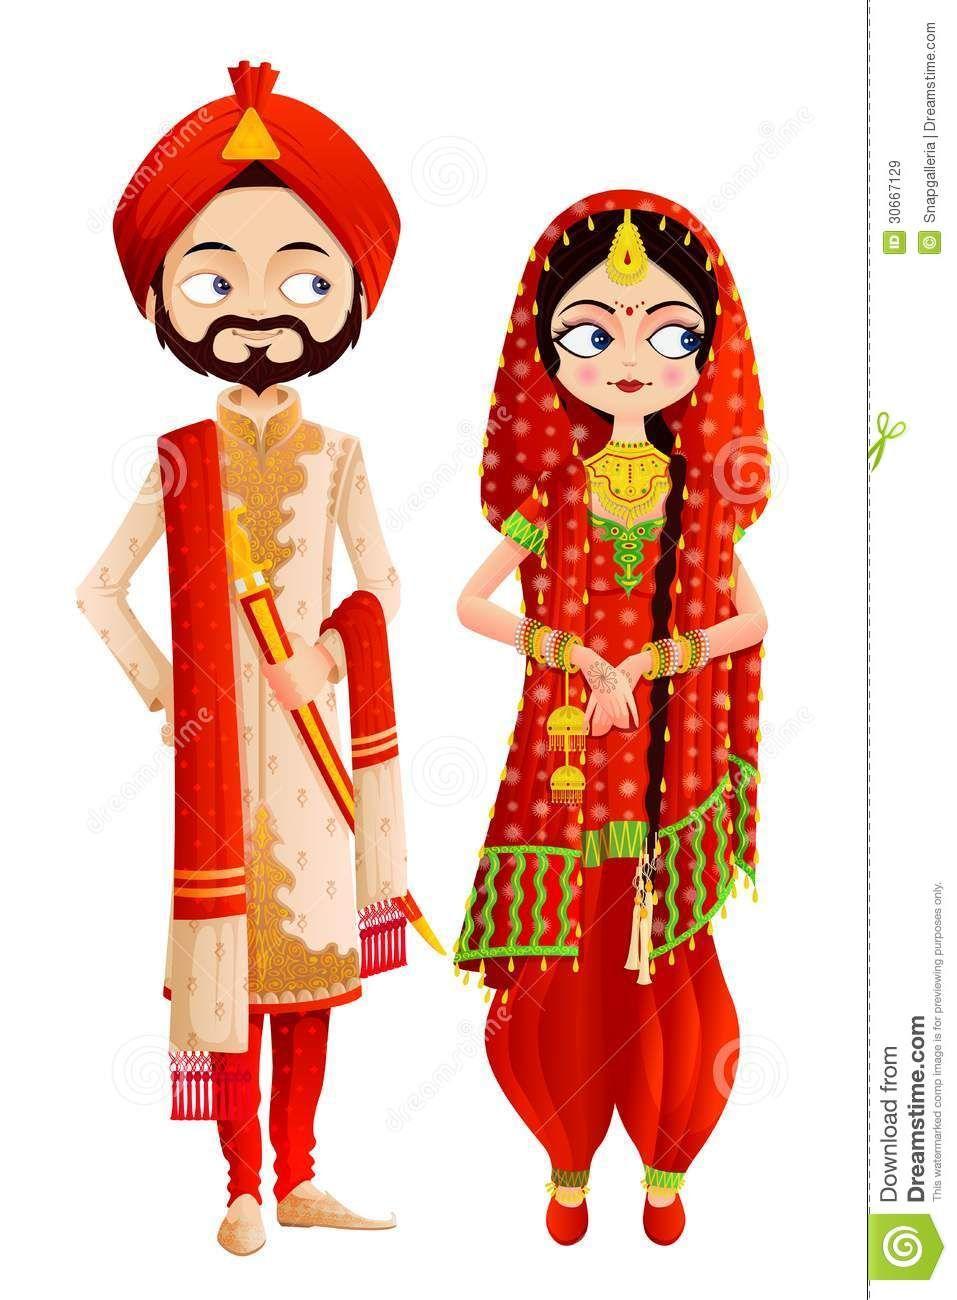 25+ Punjabi Cartoon Photo Gif